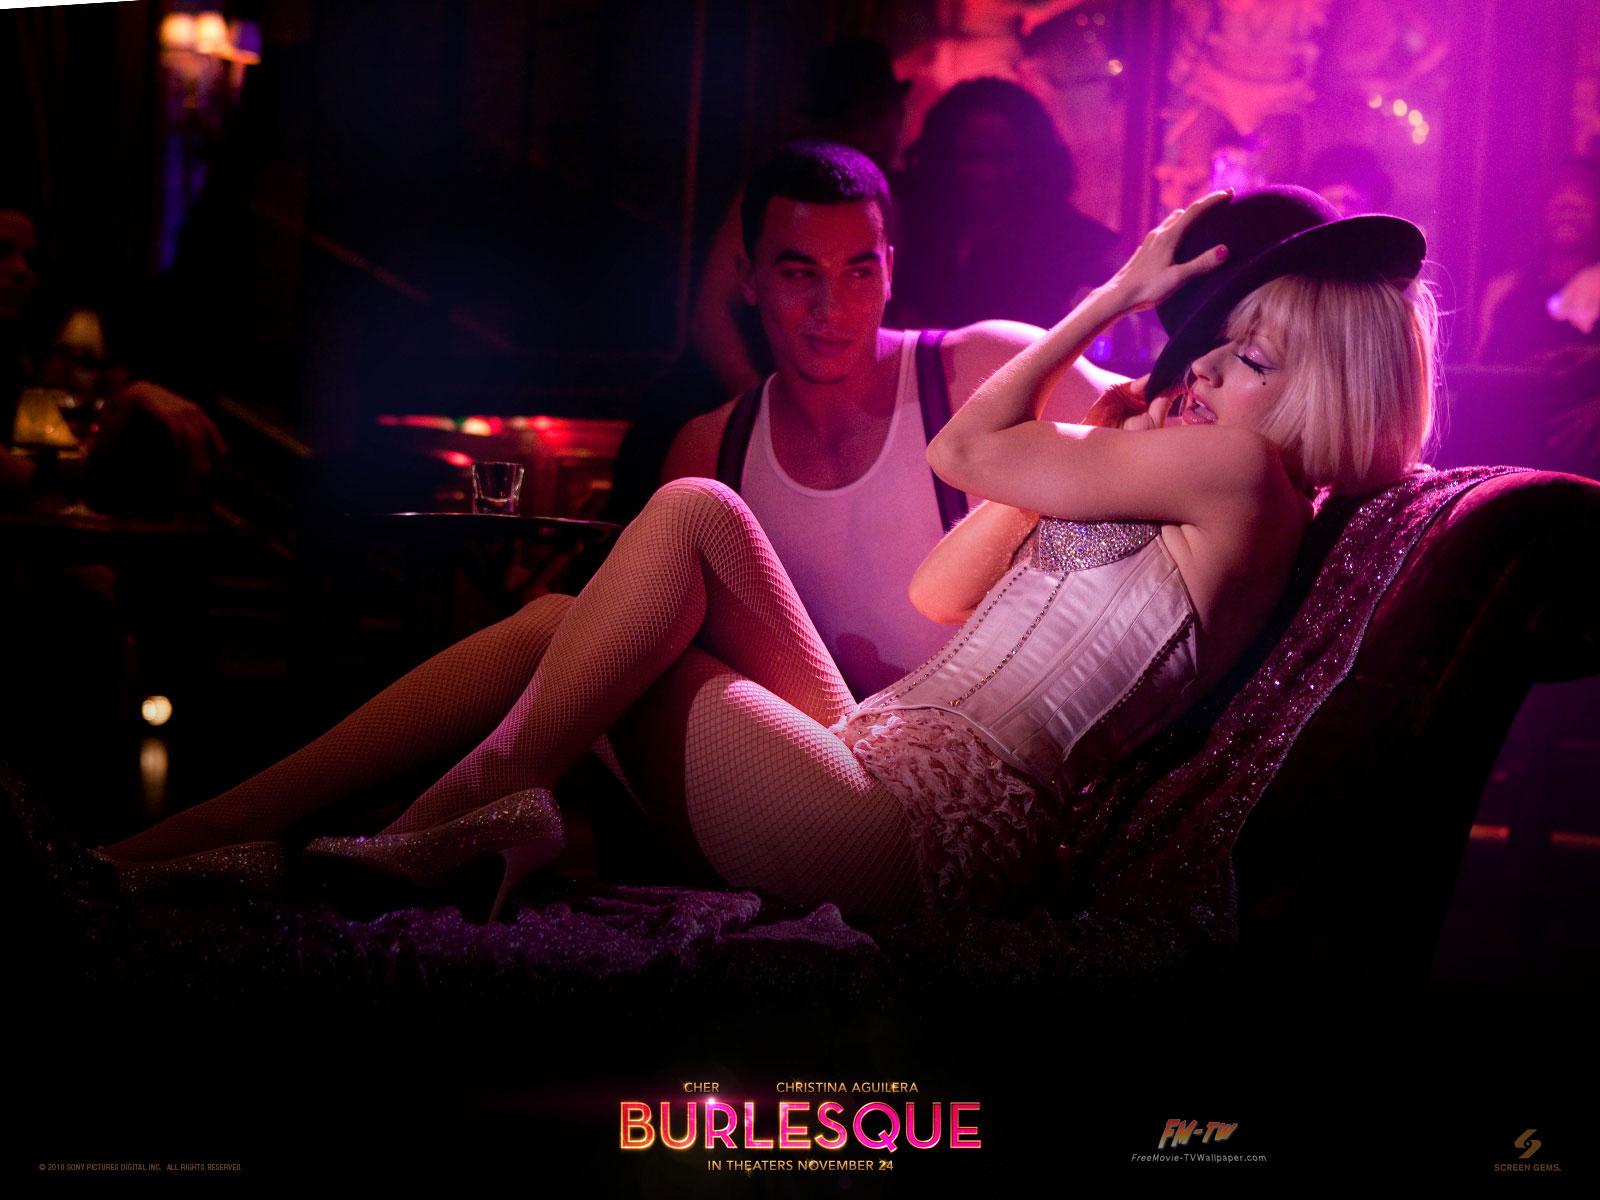 http://3.bp.blogspot.com/_zD-pecGOd2o/TRI4fqeXeOI/AAAAAAAAGbE/puwTdNb23Ko/s1600/burlesque_wallpaper09.jpg